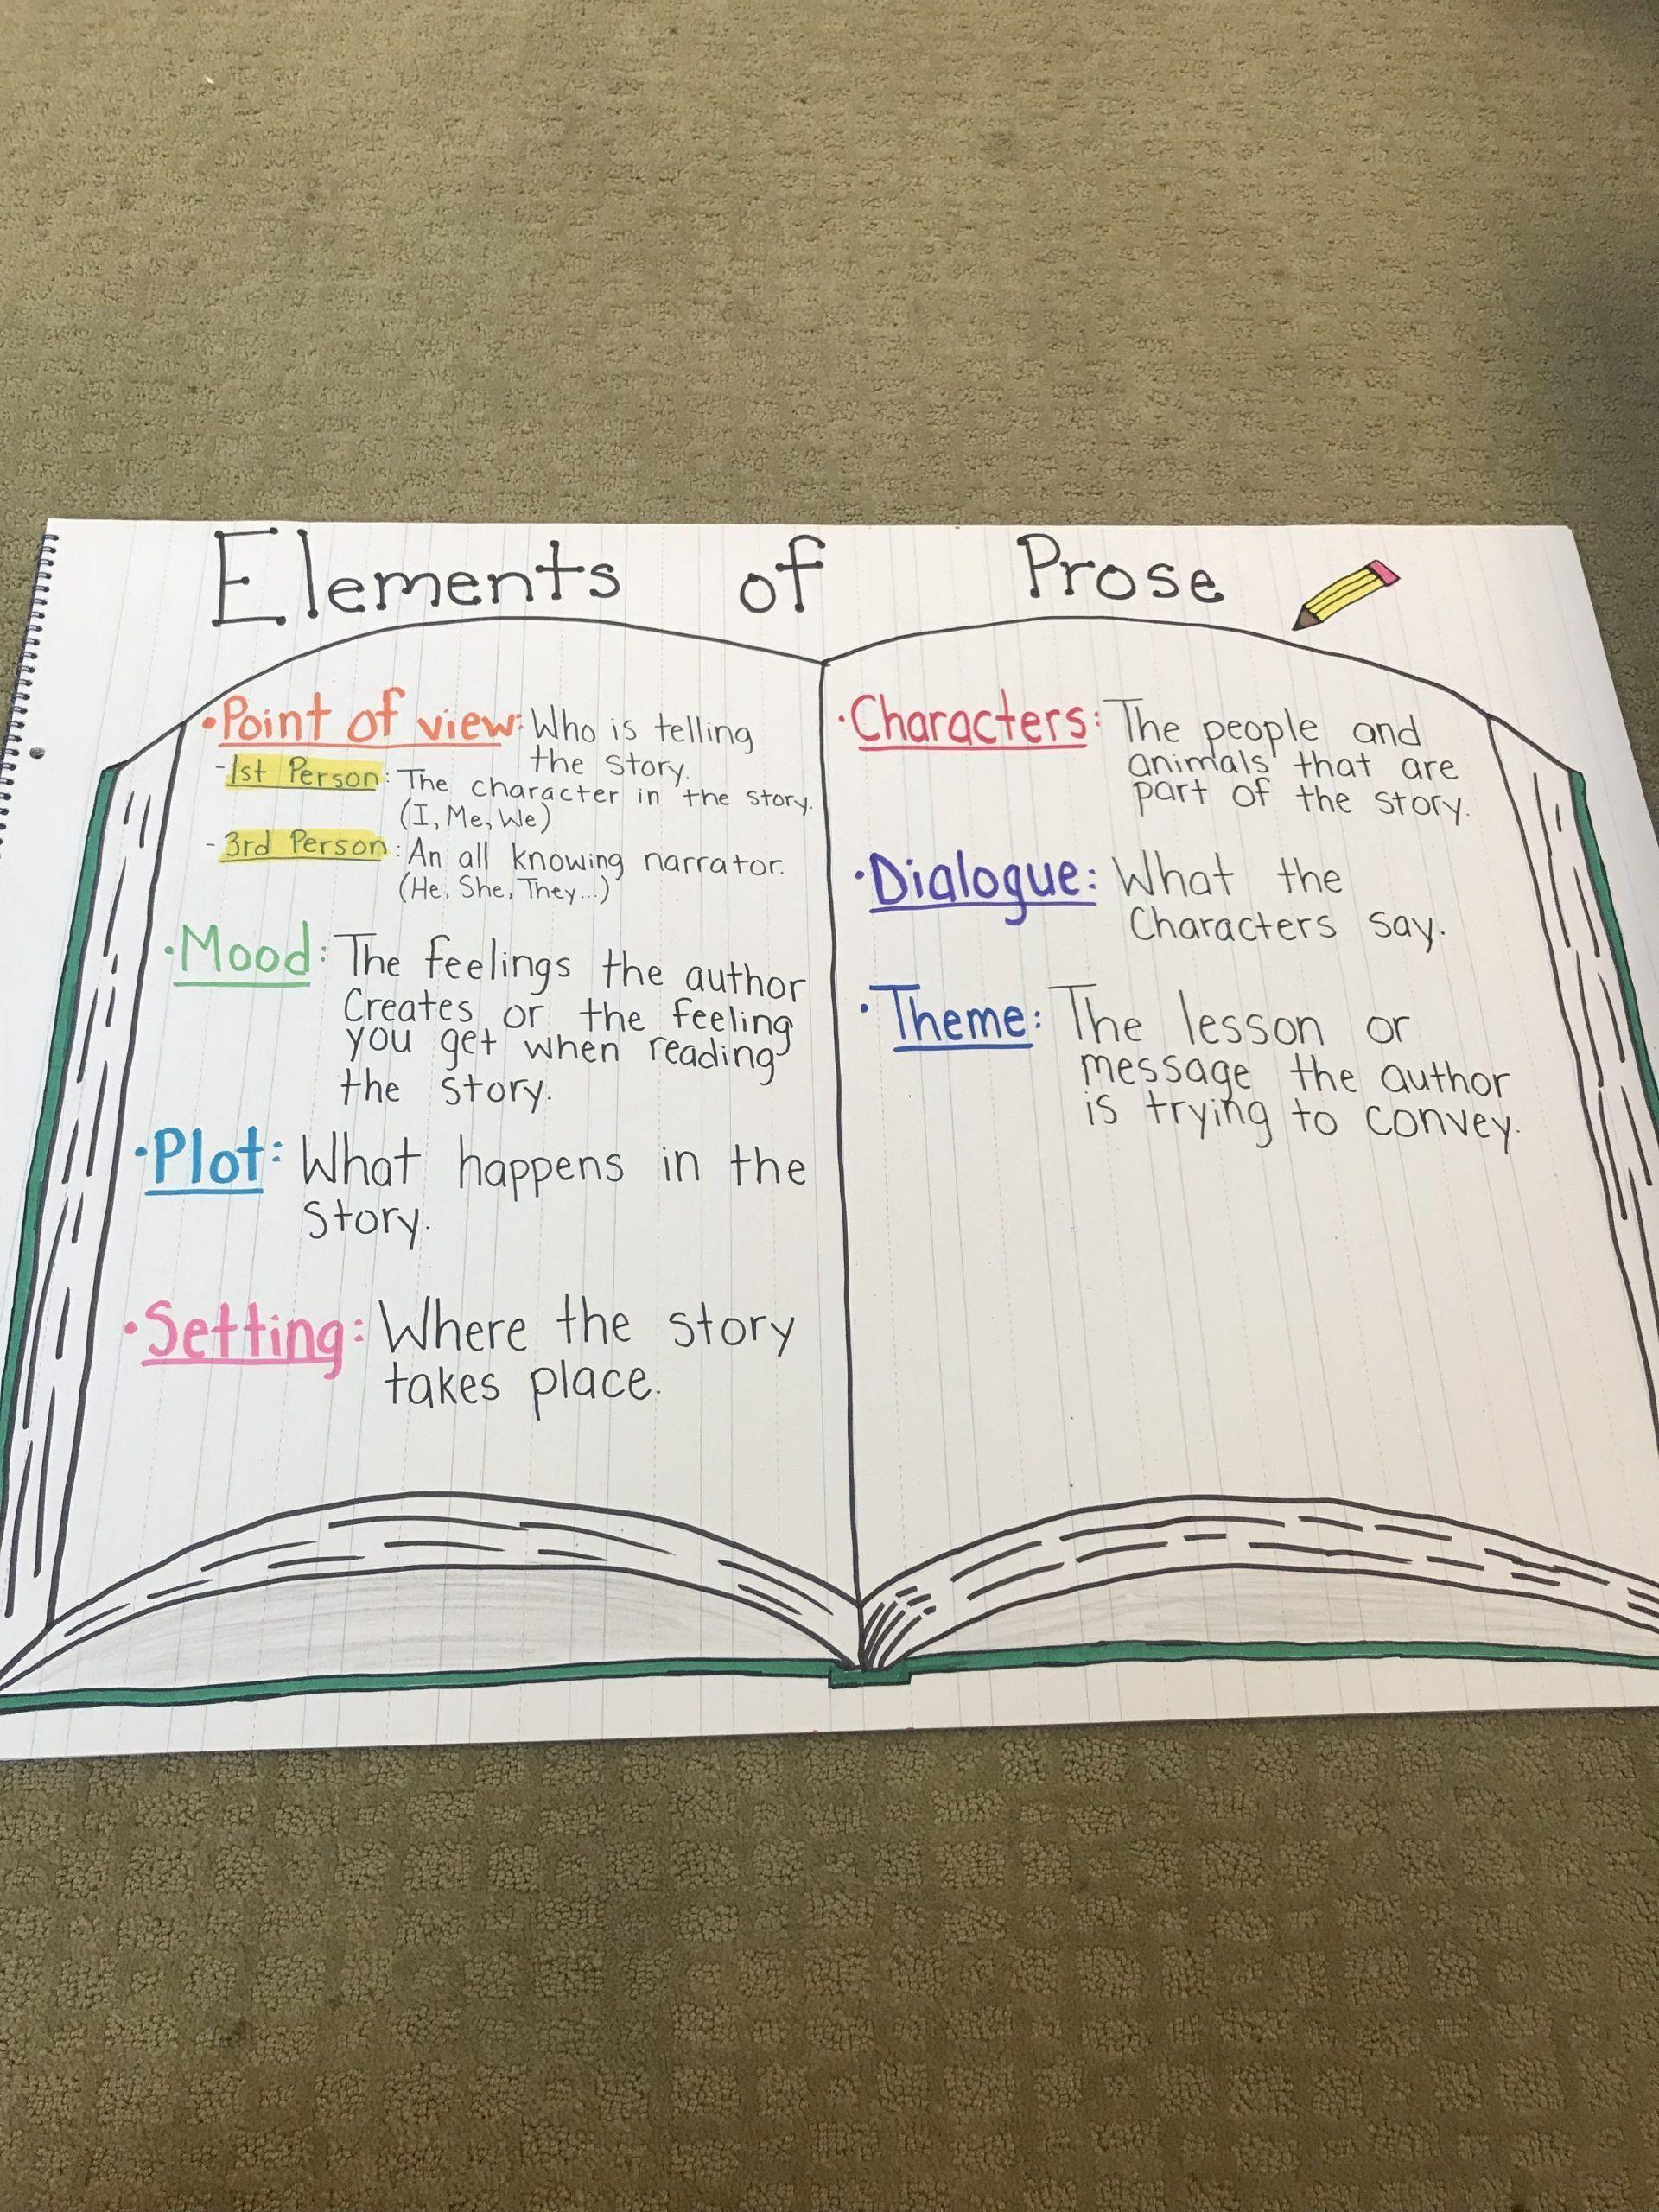 Story Elements Worksheet 3rd Grade Story Elements Worksheets 4th Grade in  2020   Story elements worksheet [ 2560 x 1920 Pixel ]